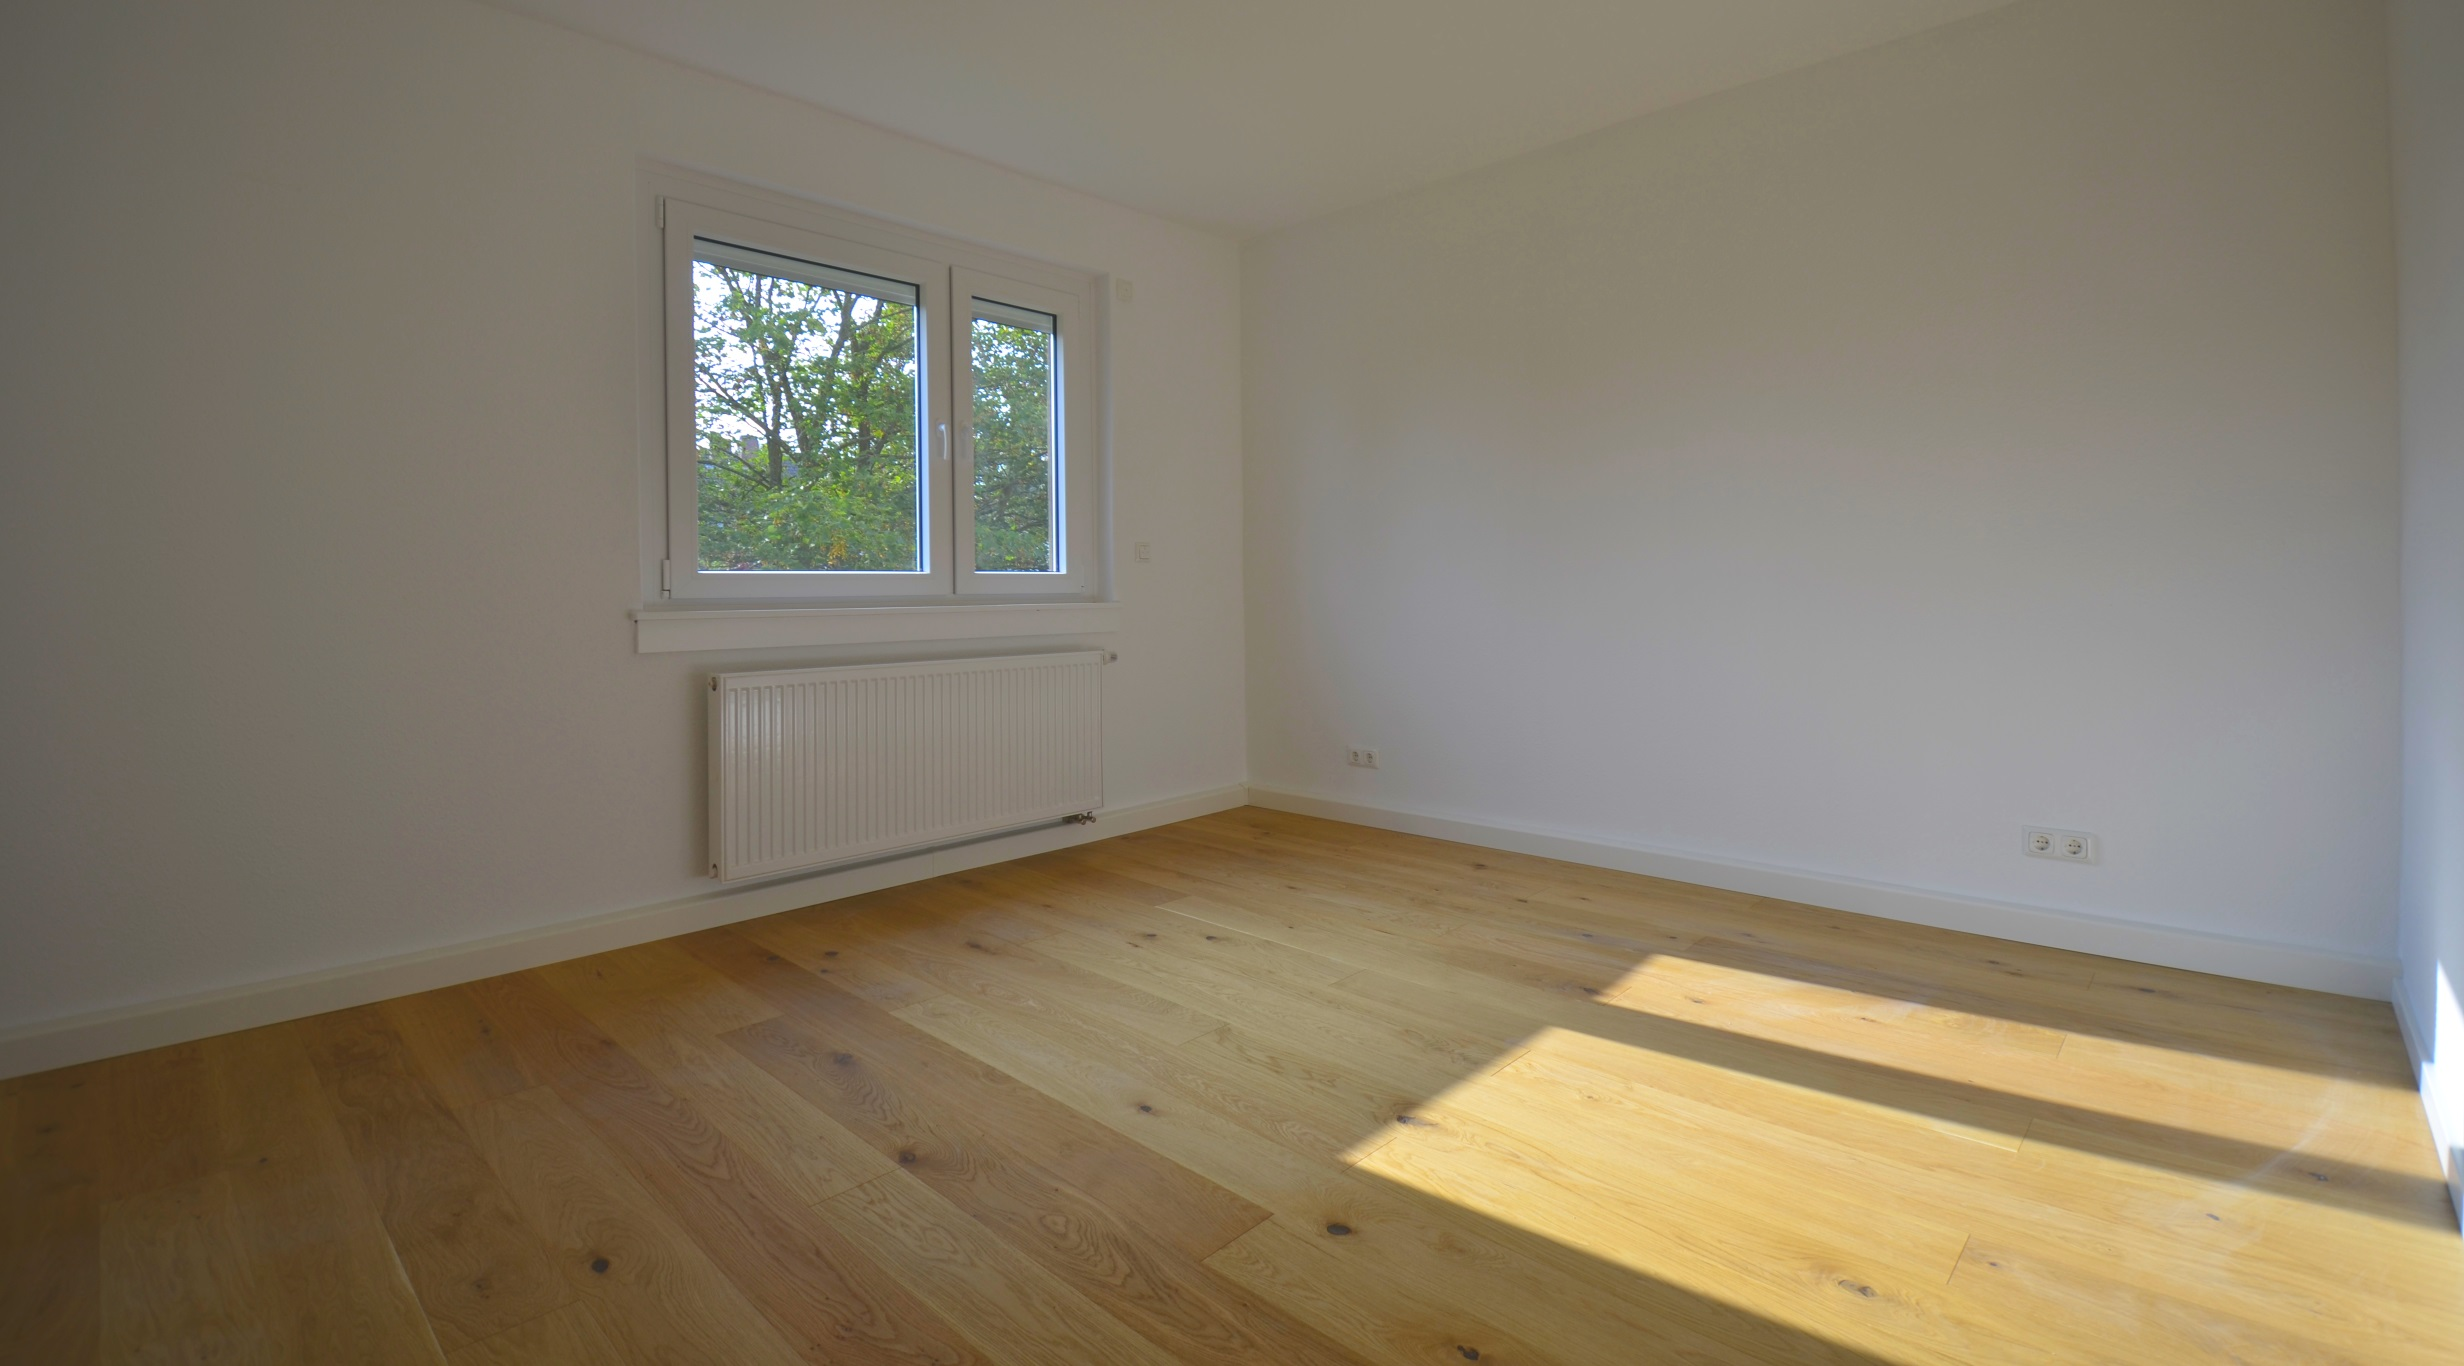 weber immobilien eigenbedarf nur keine fehler machen. Black Bedroom Furniture Sets. Home Design Ideas